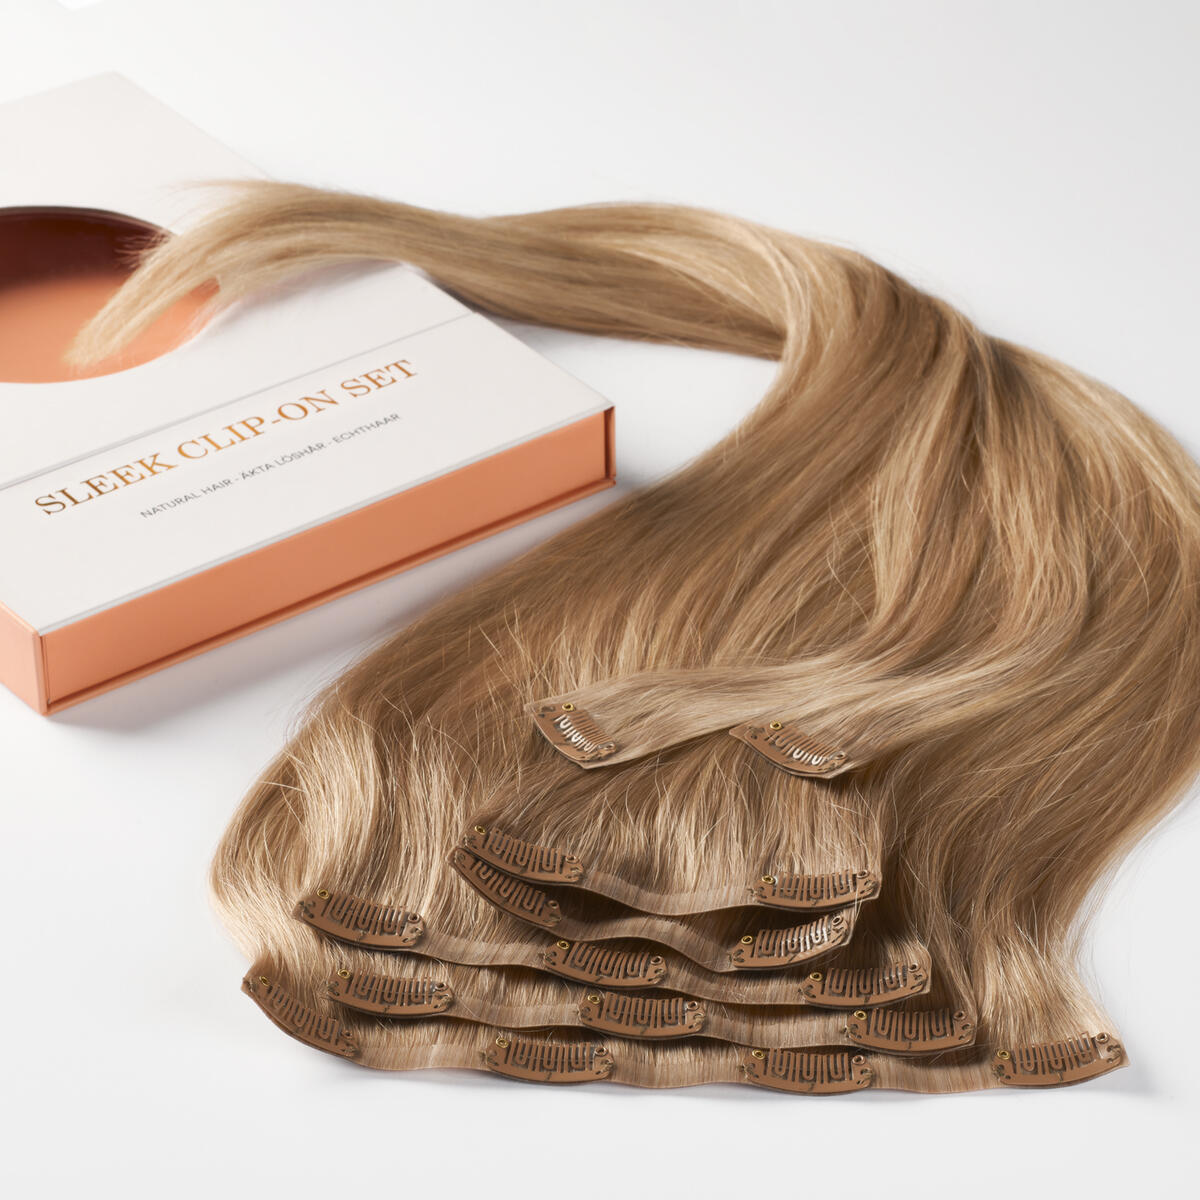 Sleek Clip-on set B7.5/10.7 Sandy Blonde Balayage 50 cm